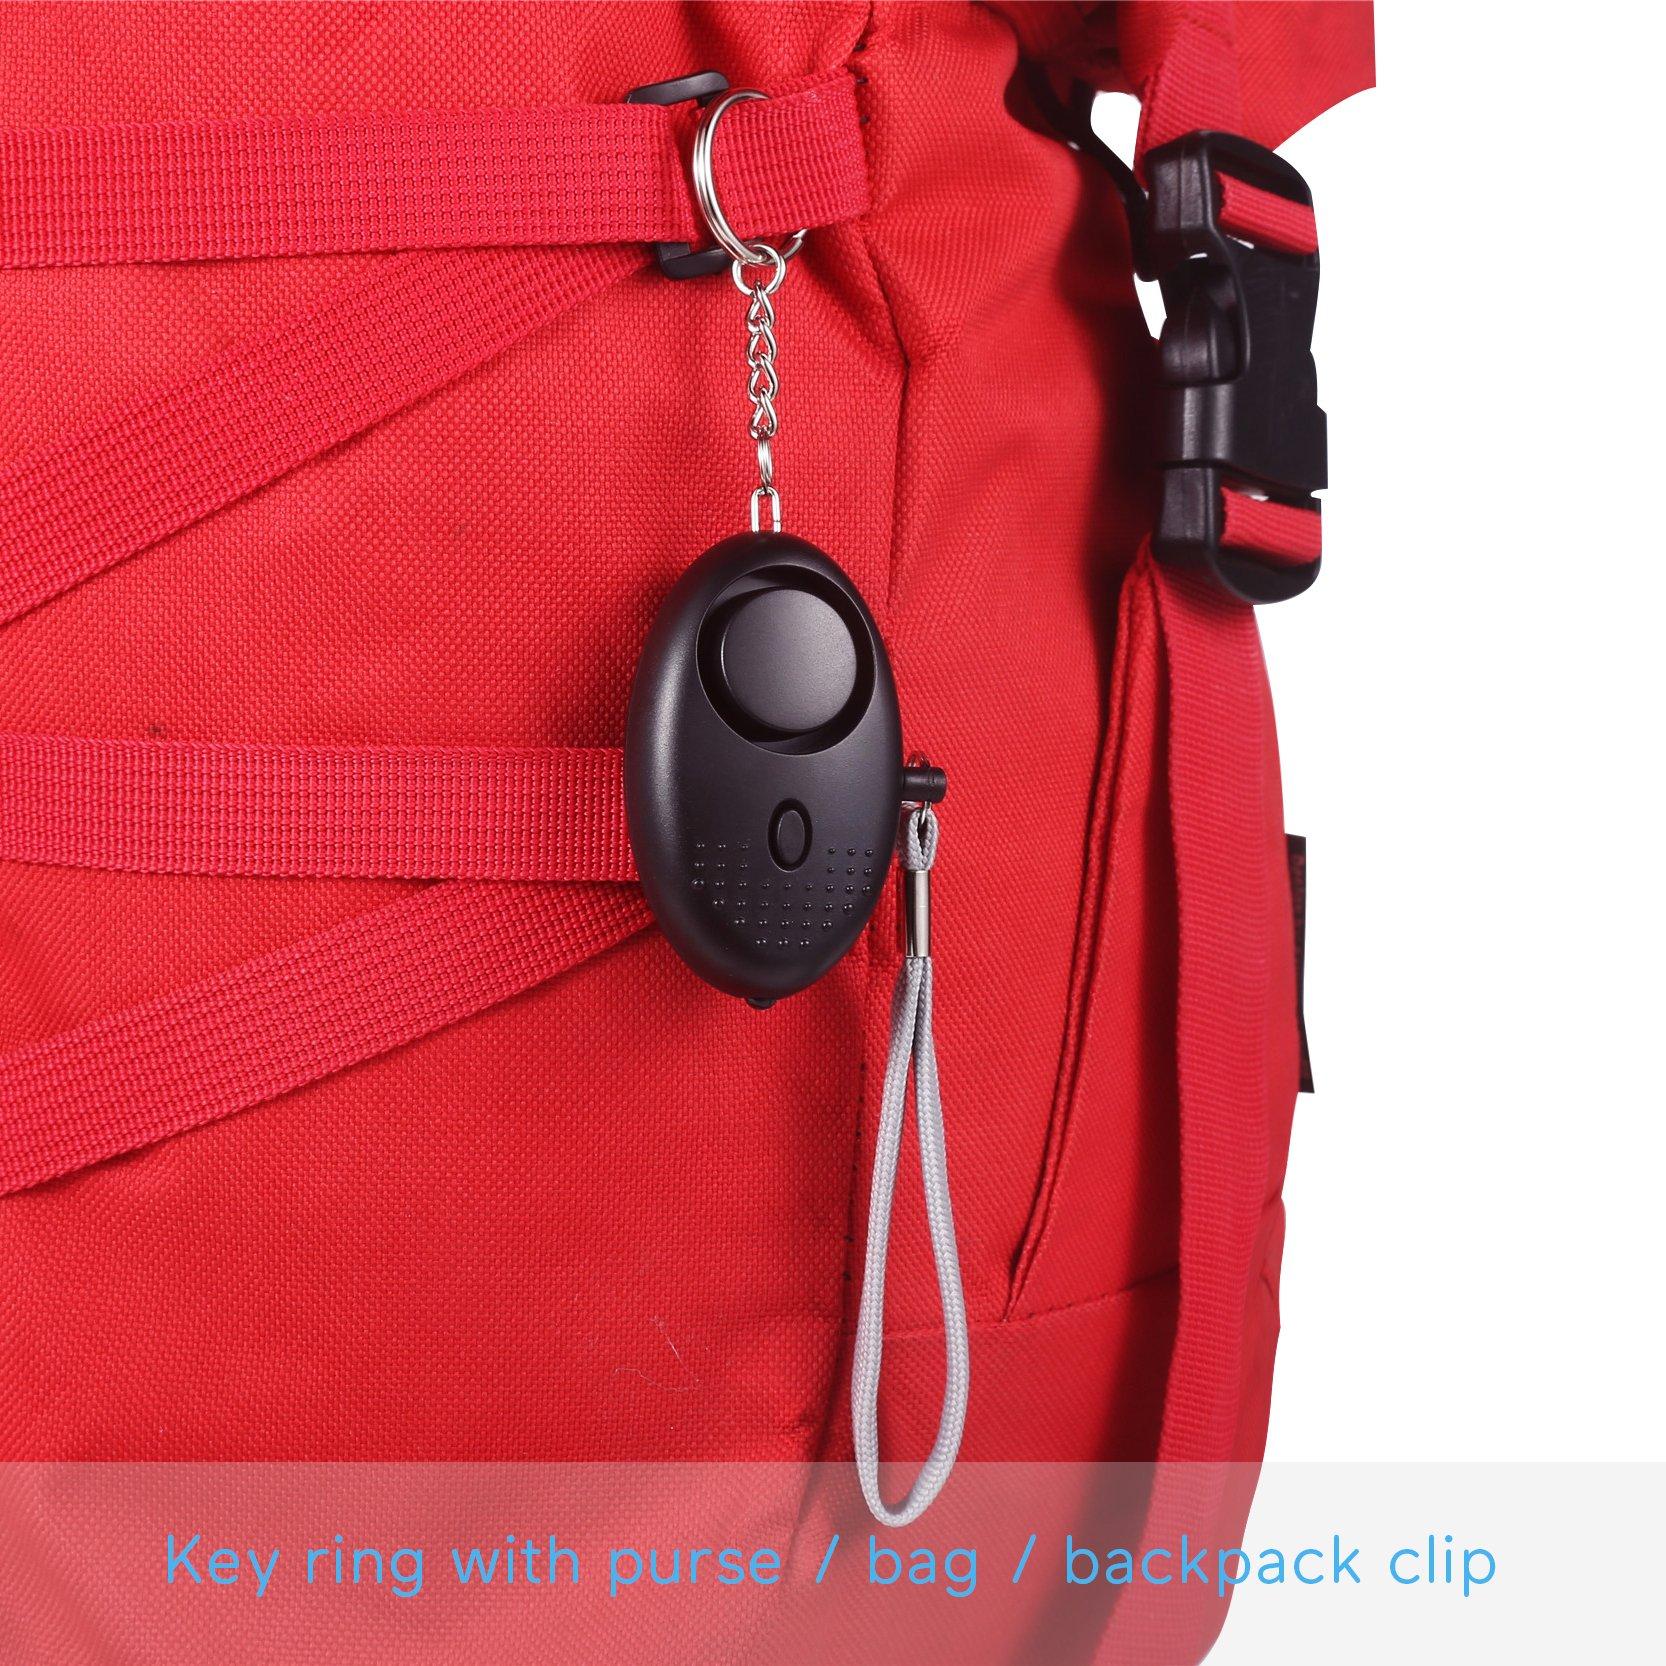 Personal Alarm Keychain for Women, Safe Sound Personal Alarm, Portable Personal Alarm for Girls, 130DB Emergency Self-Defense Security Alarm system w/ LED Light for Outdoor Men Girls Elderly Black